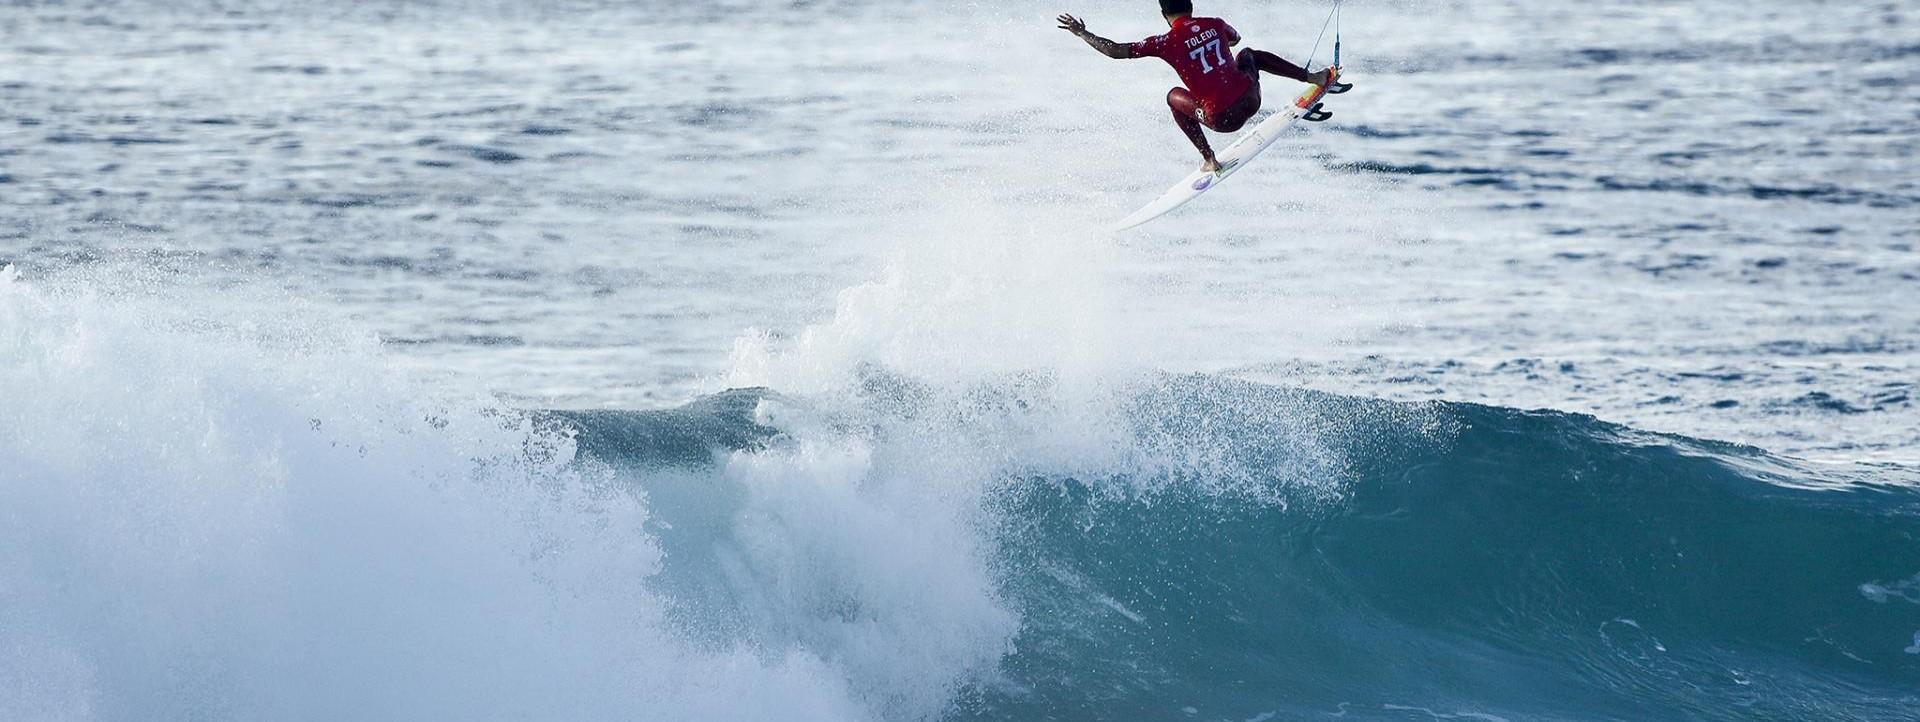 News Surf Quik Pro France 2016 : John John Florence au repêchage, Toledo impérial